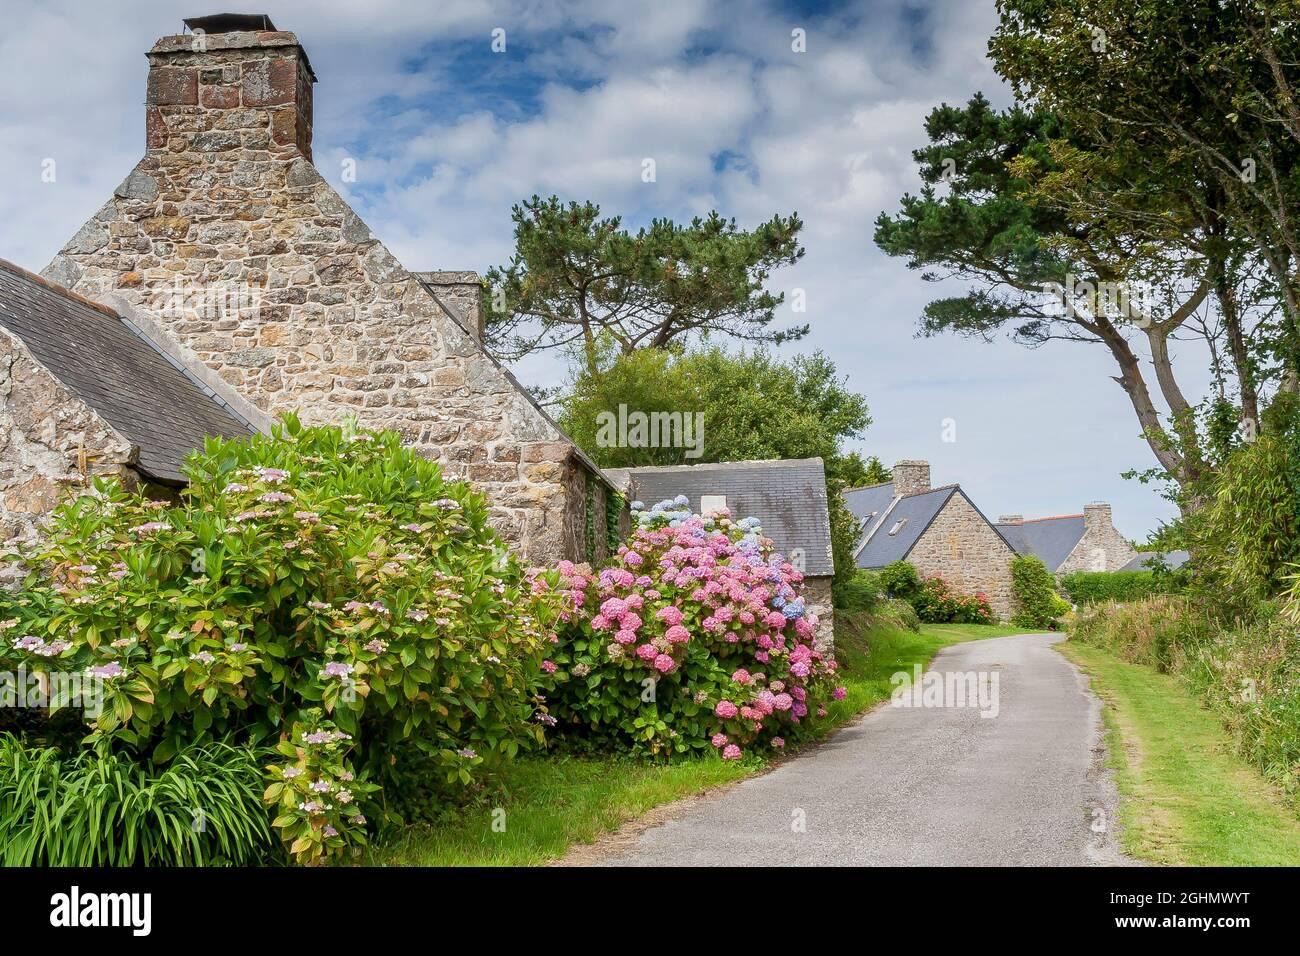 Hameau de Kerroux, Penty, Peninsule de Crozon, Finisterre, Francia Foto de stock